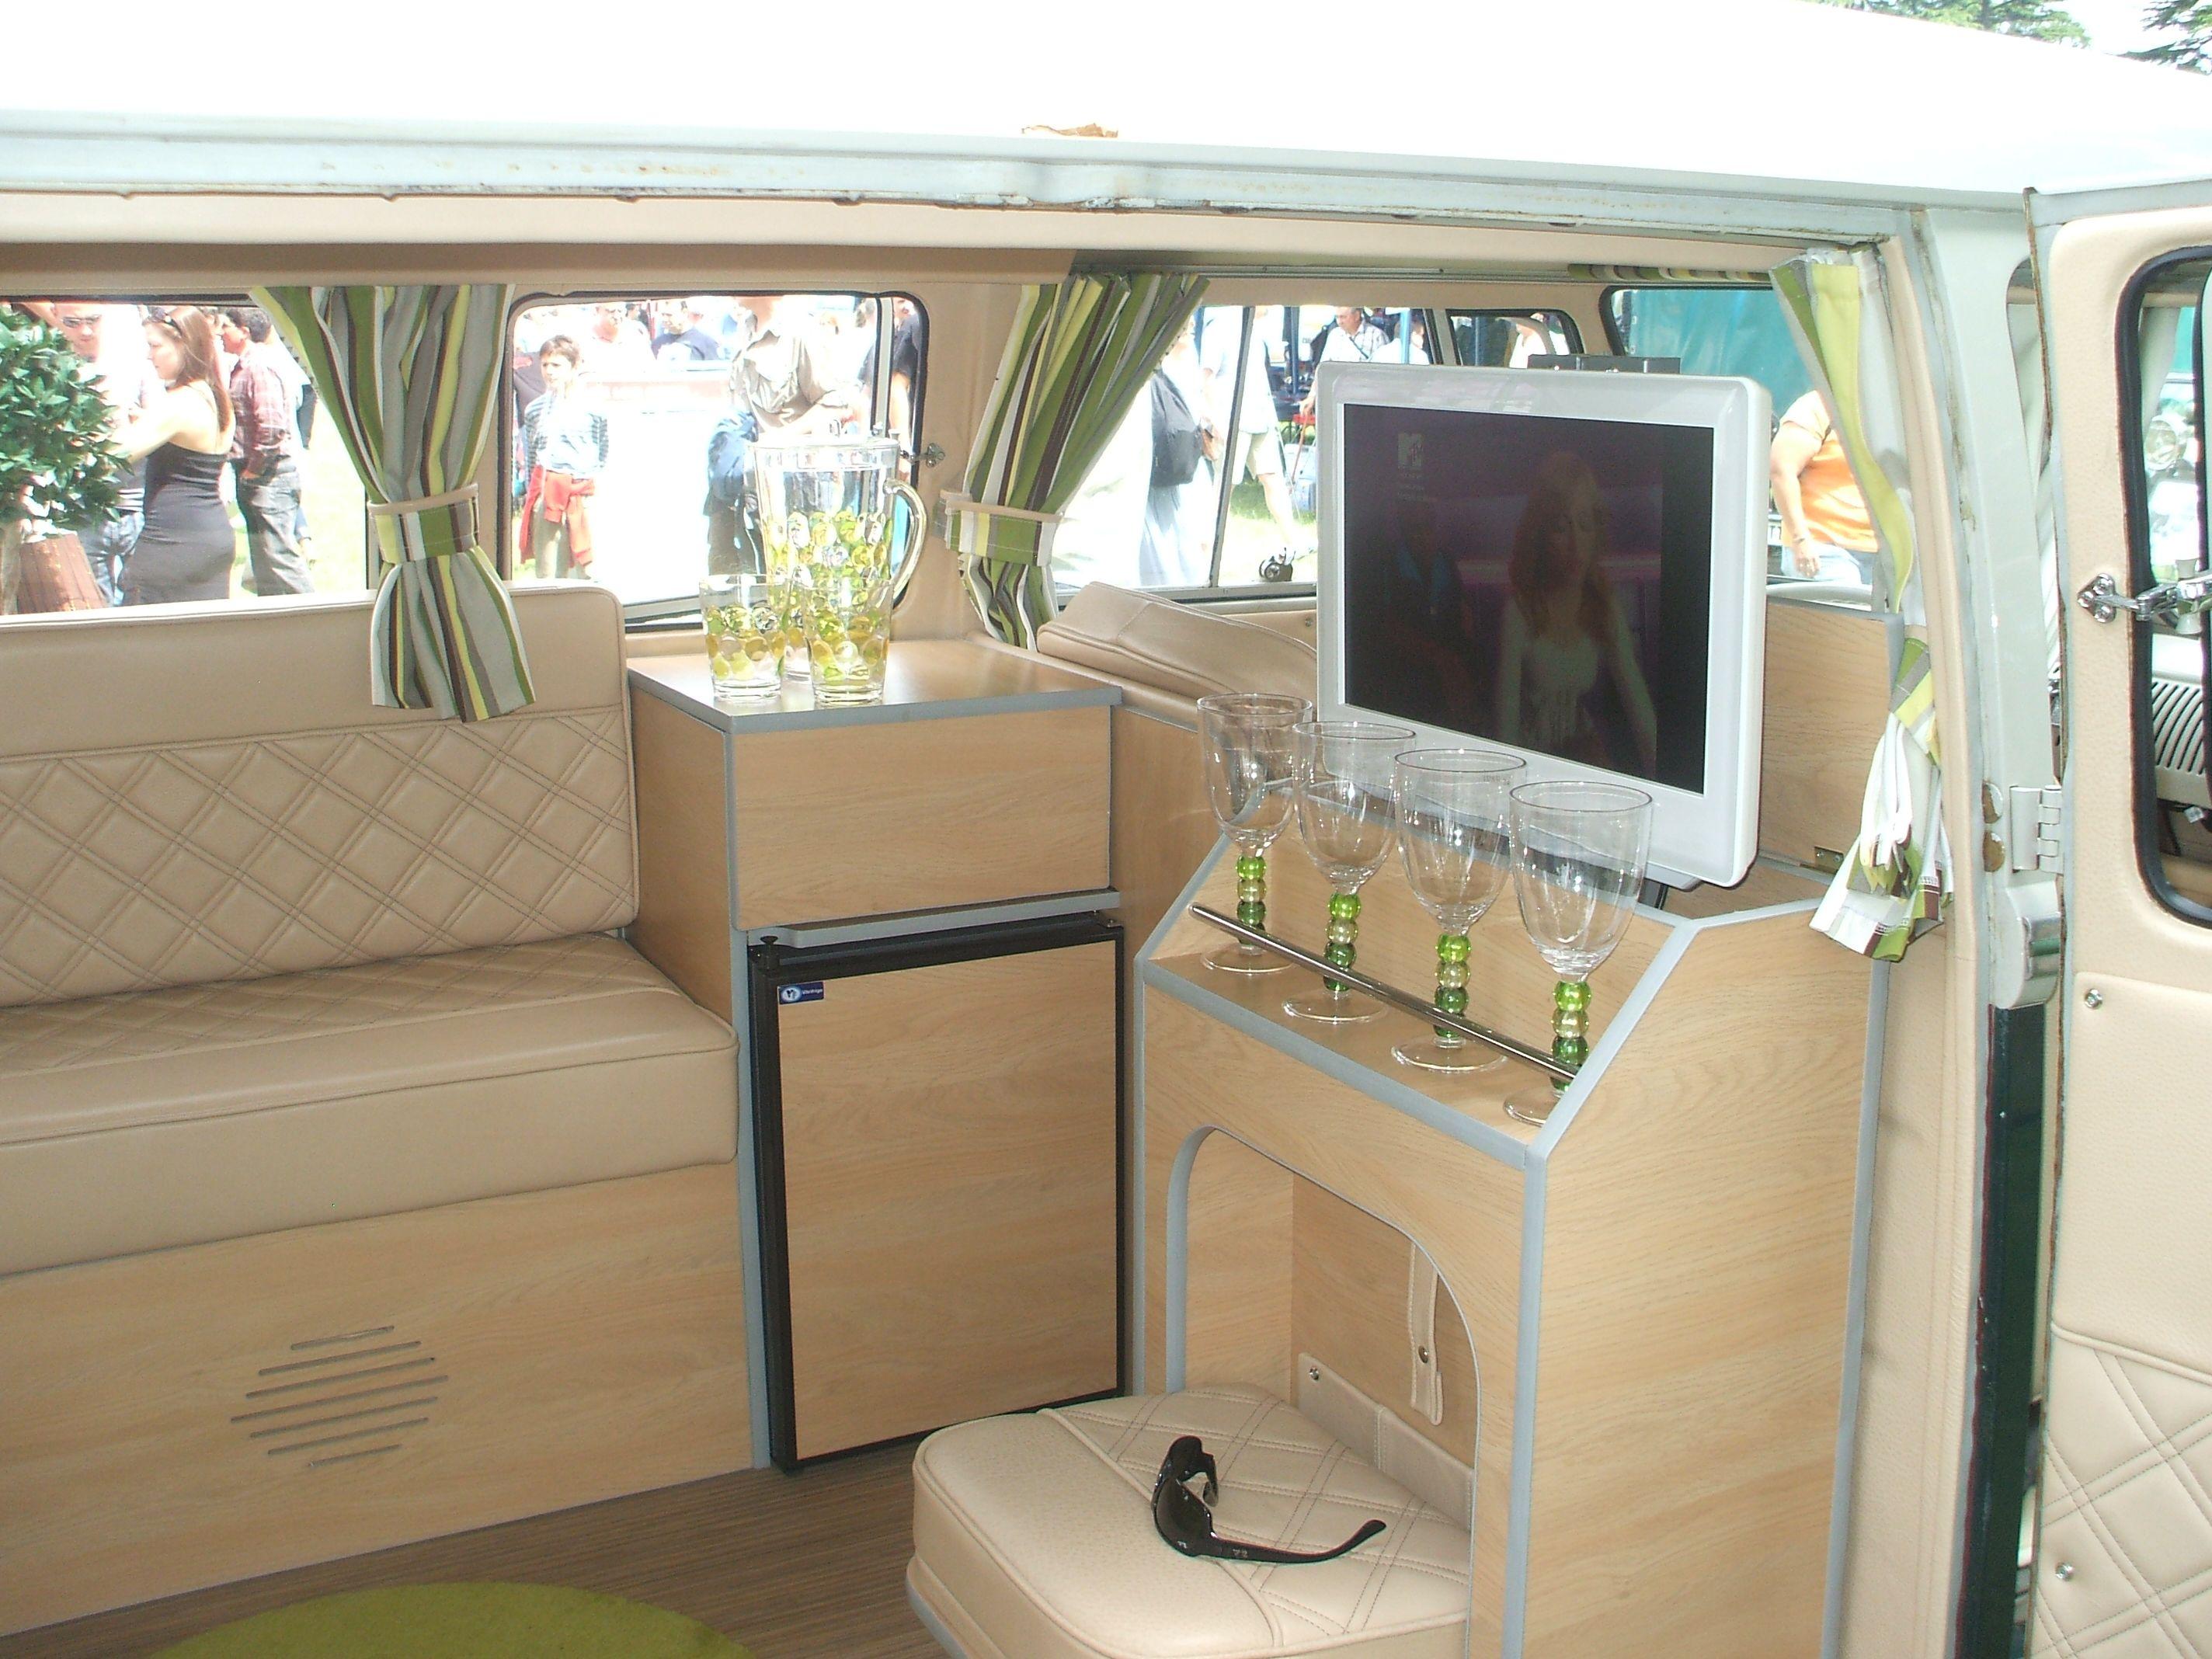 Restored vw camper van storage with drop down seat for Interieur combi split